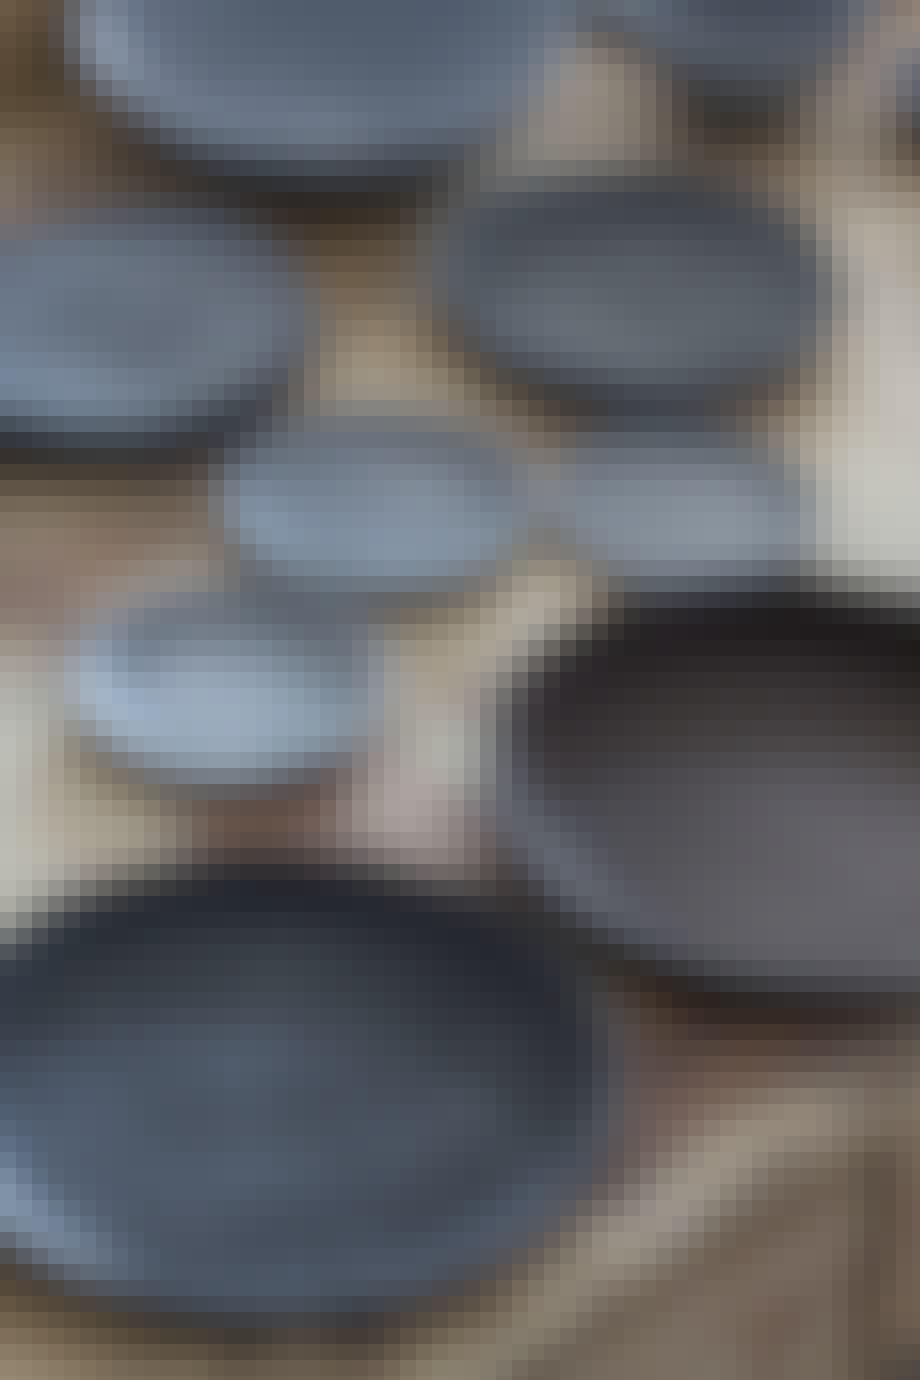 Keramikkverksted med brennovn